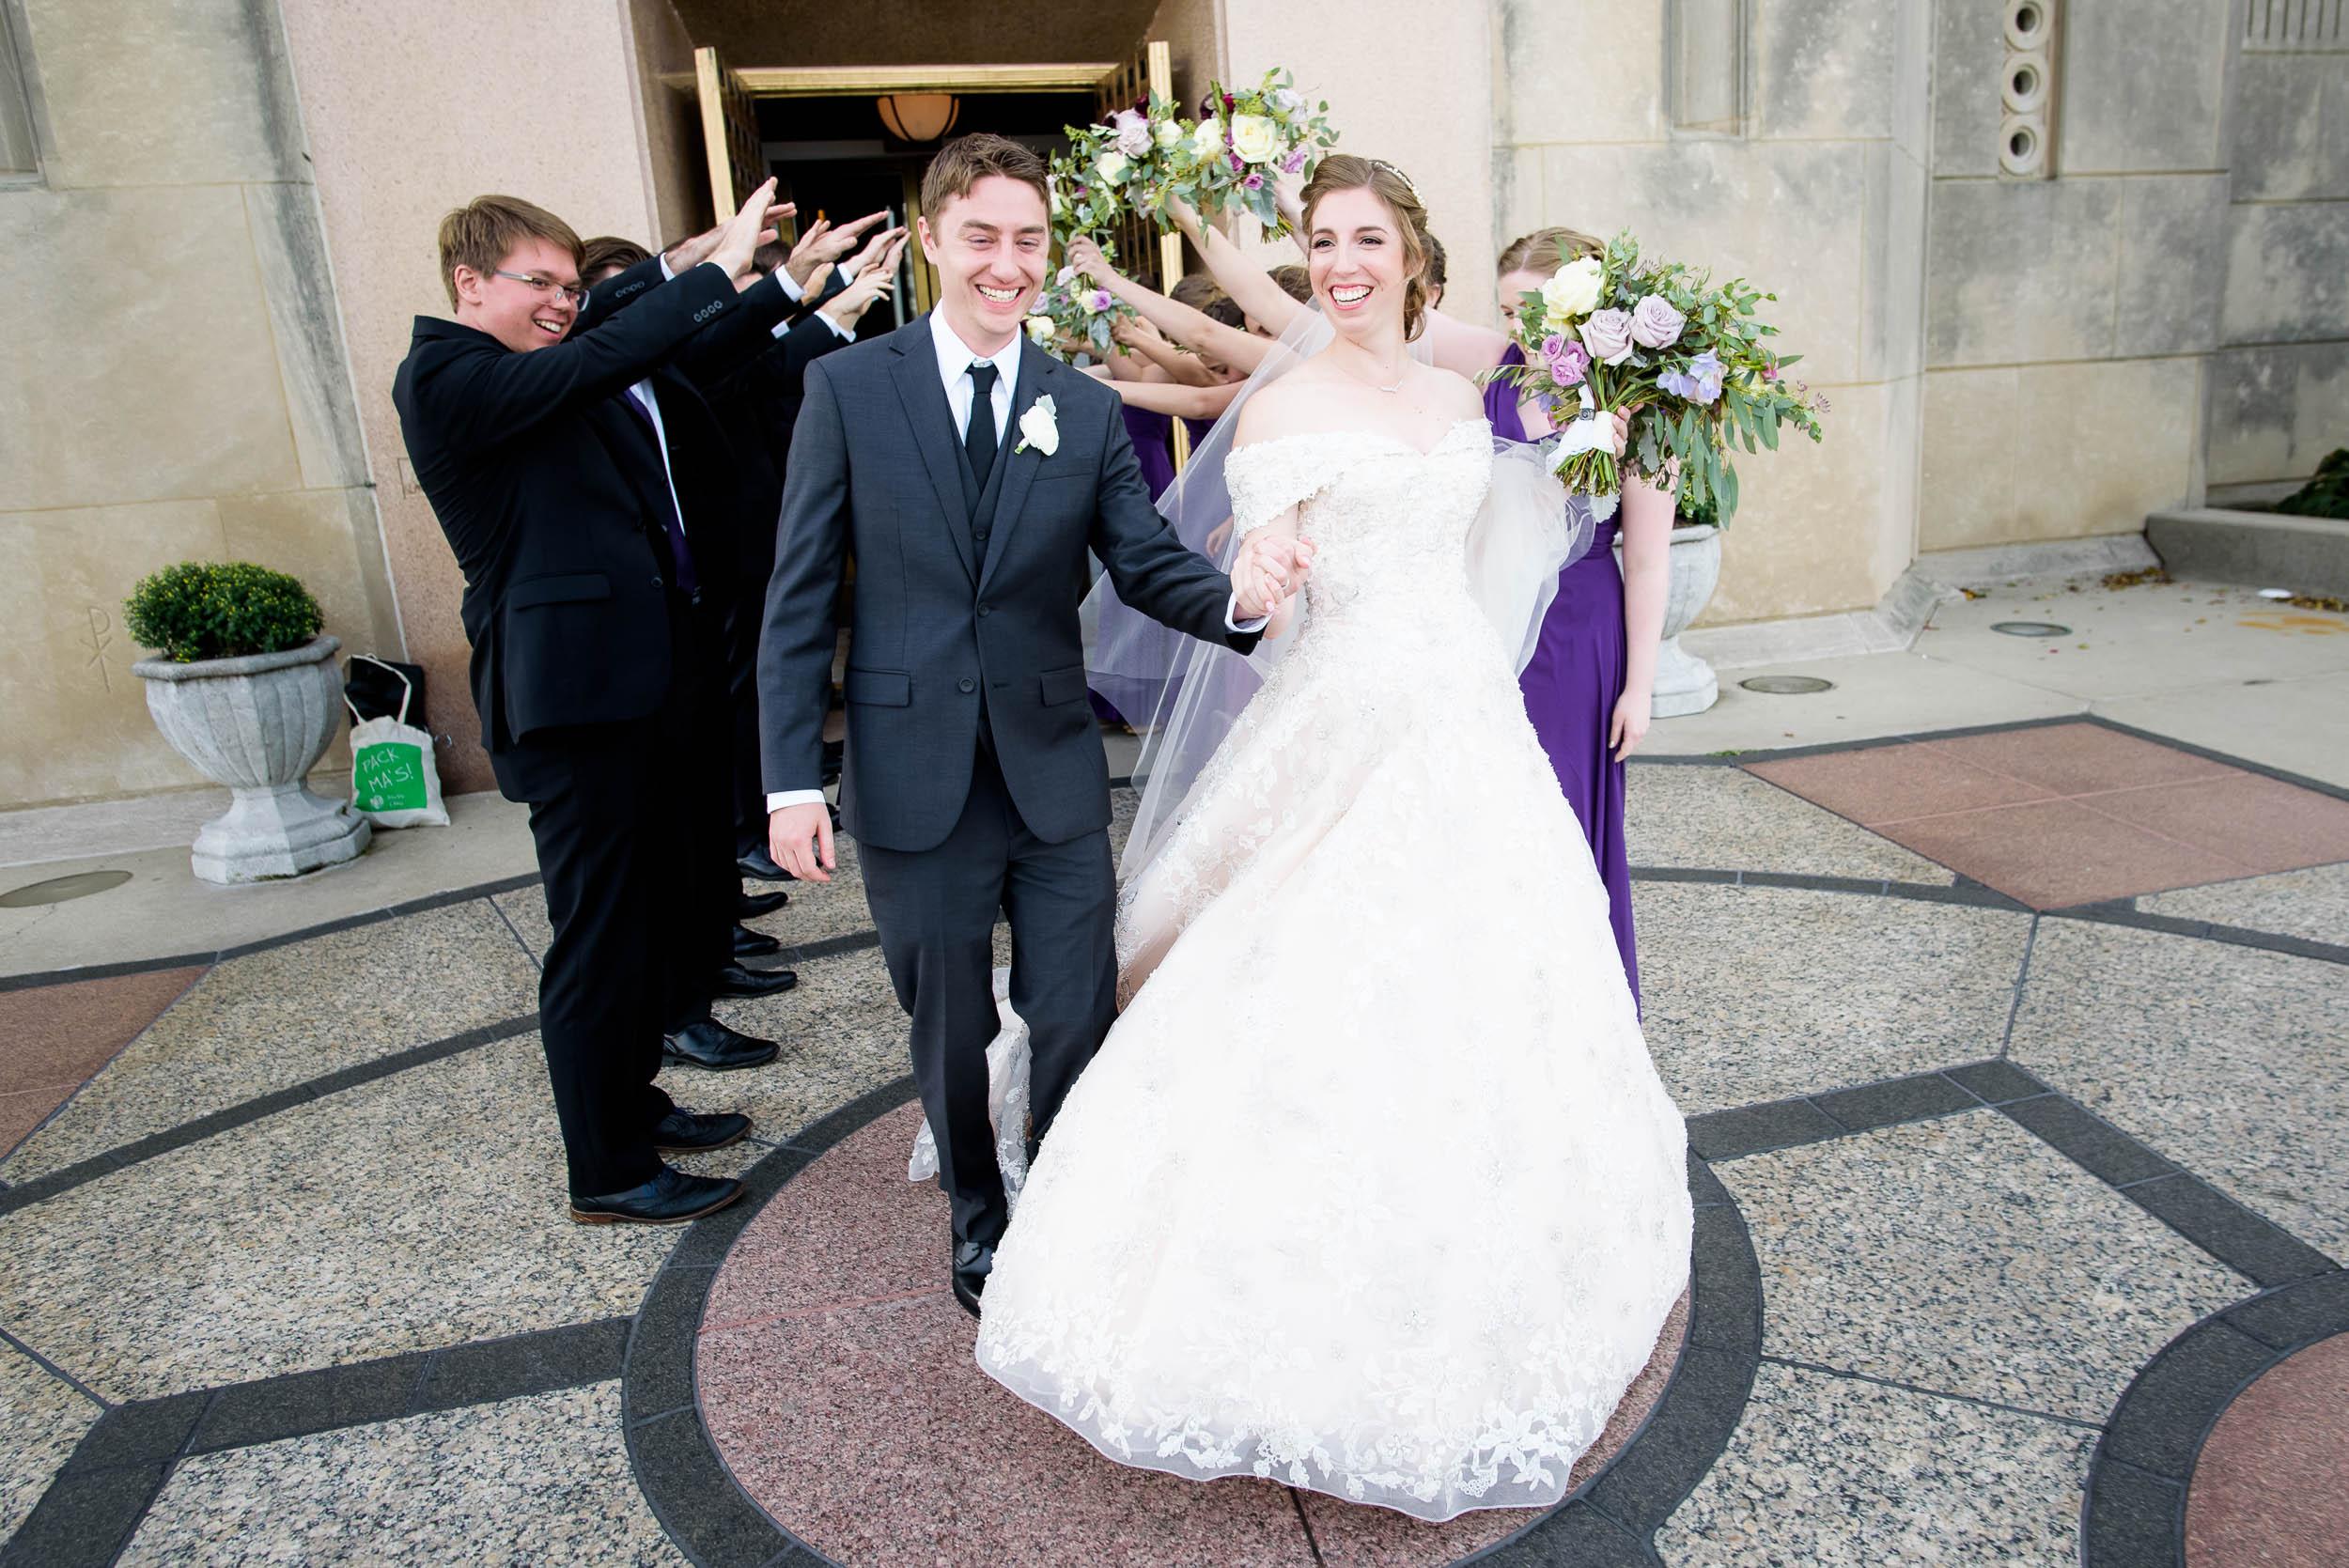 Bride and groom exit the church during a wedding ceremony at Madonna Della Strada.